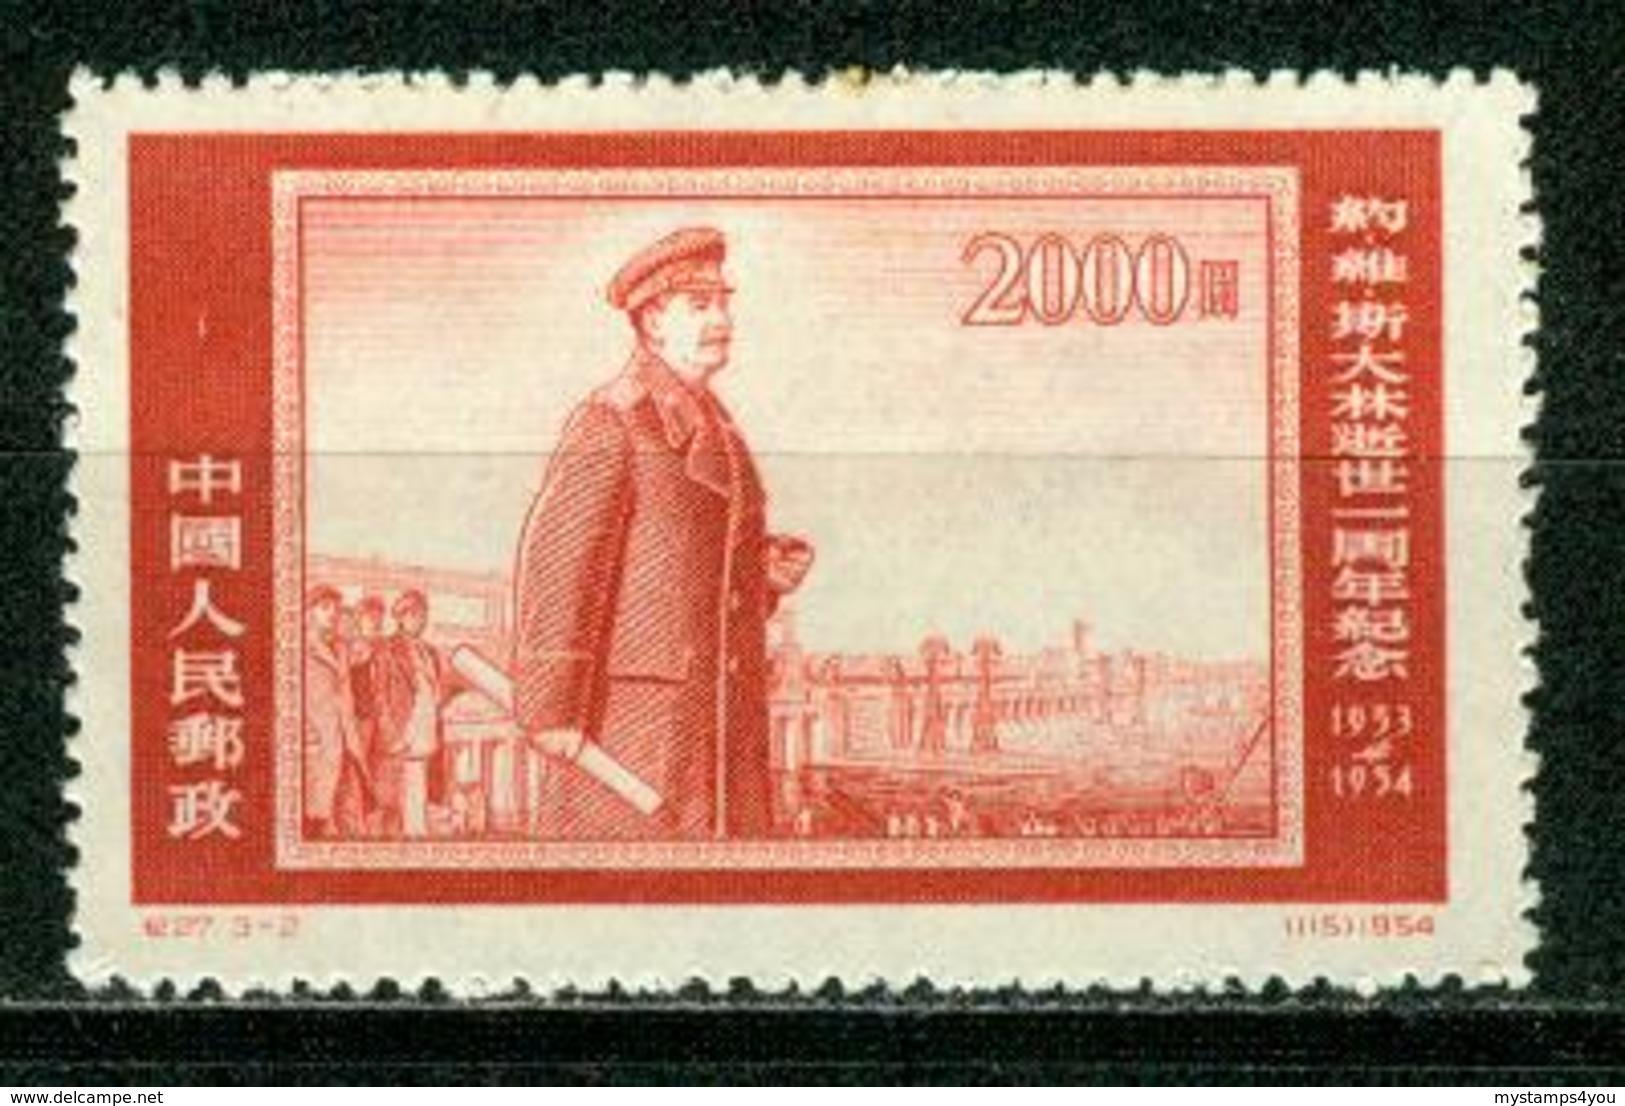 BM China, Volksrepublik 1954 | MiNr 257 | MNG | 1. Todestag Stalins, Wasserkraftwerk - Unused Stamps